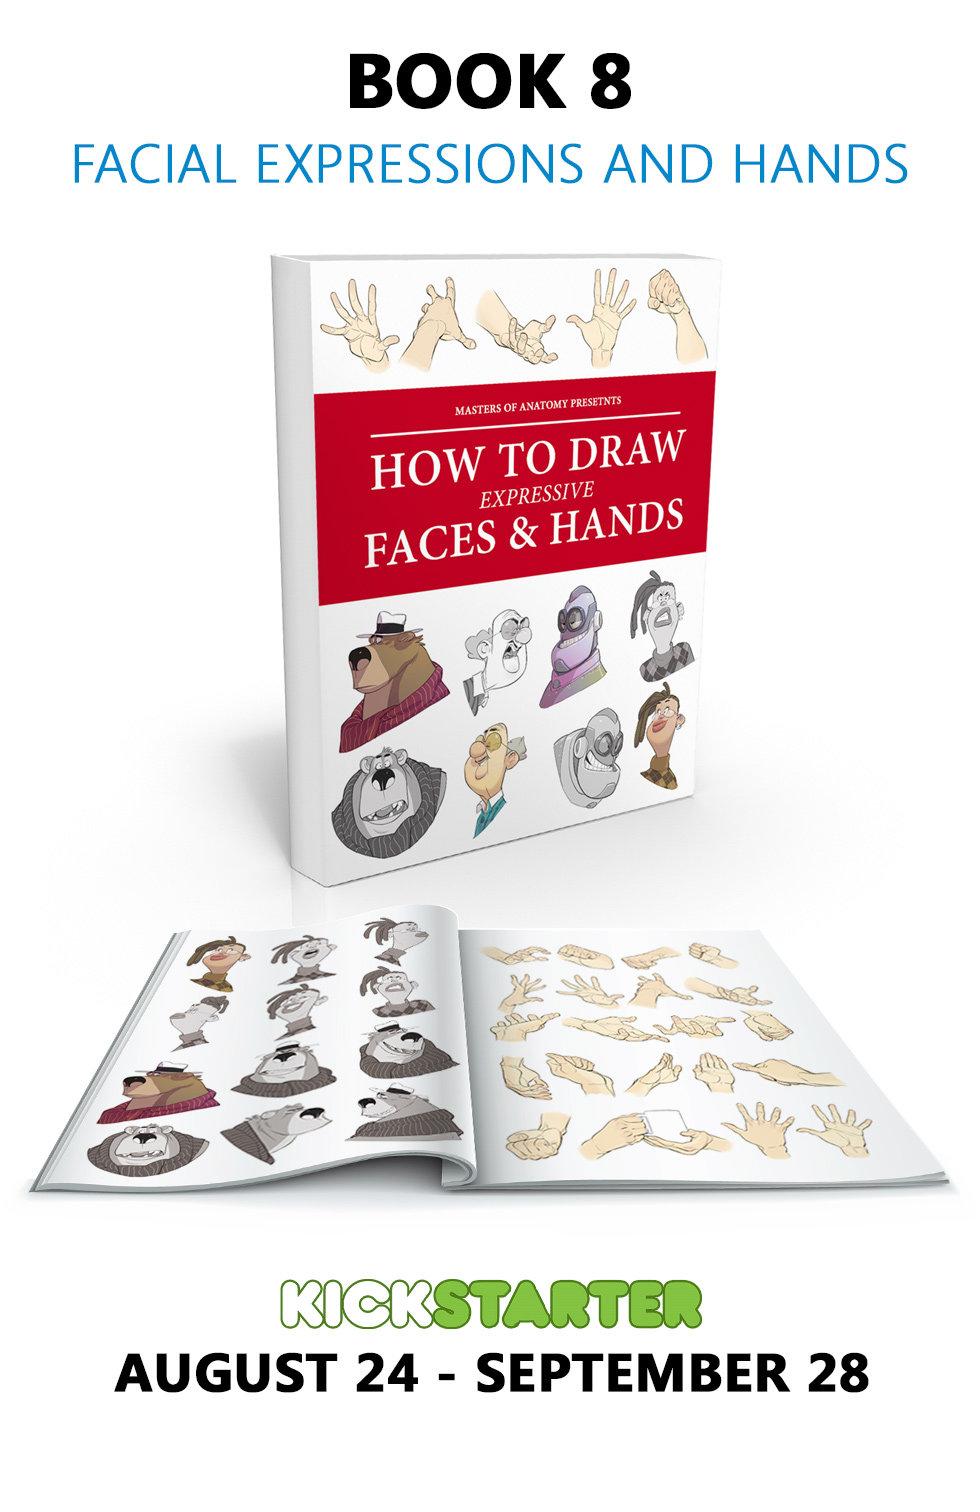 ad_book_8_fullbook.jpg